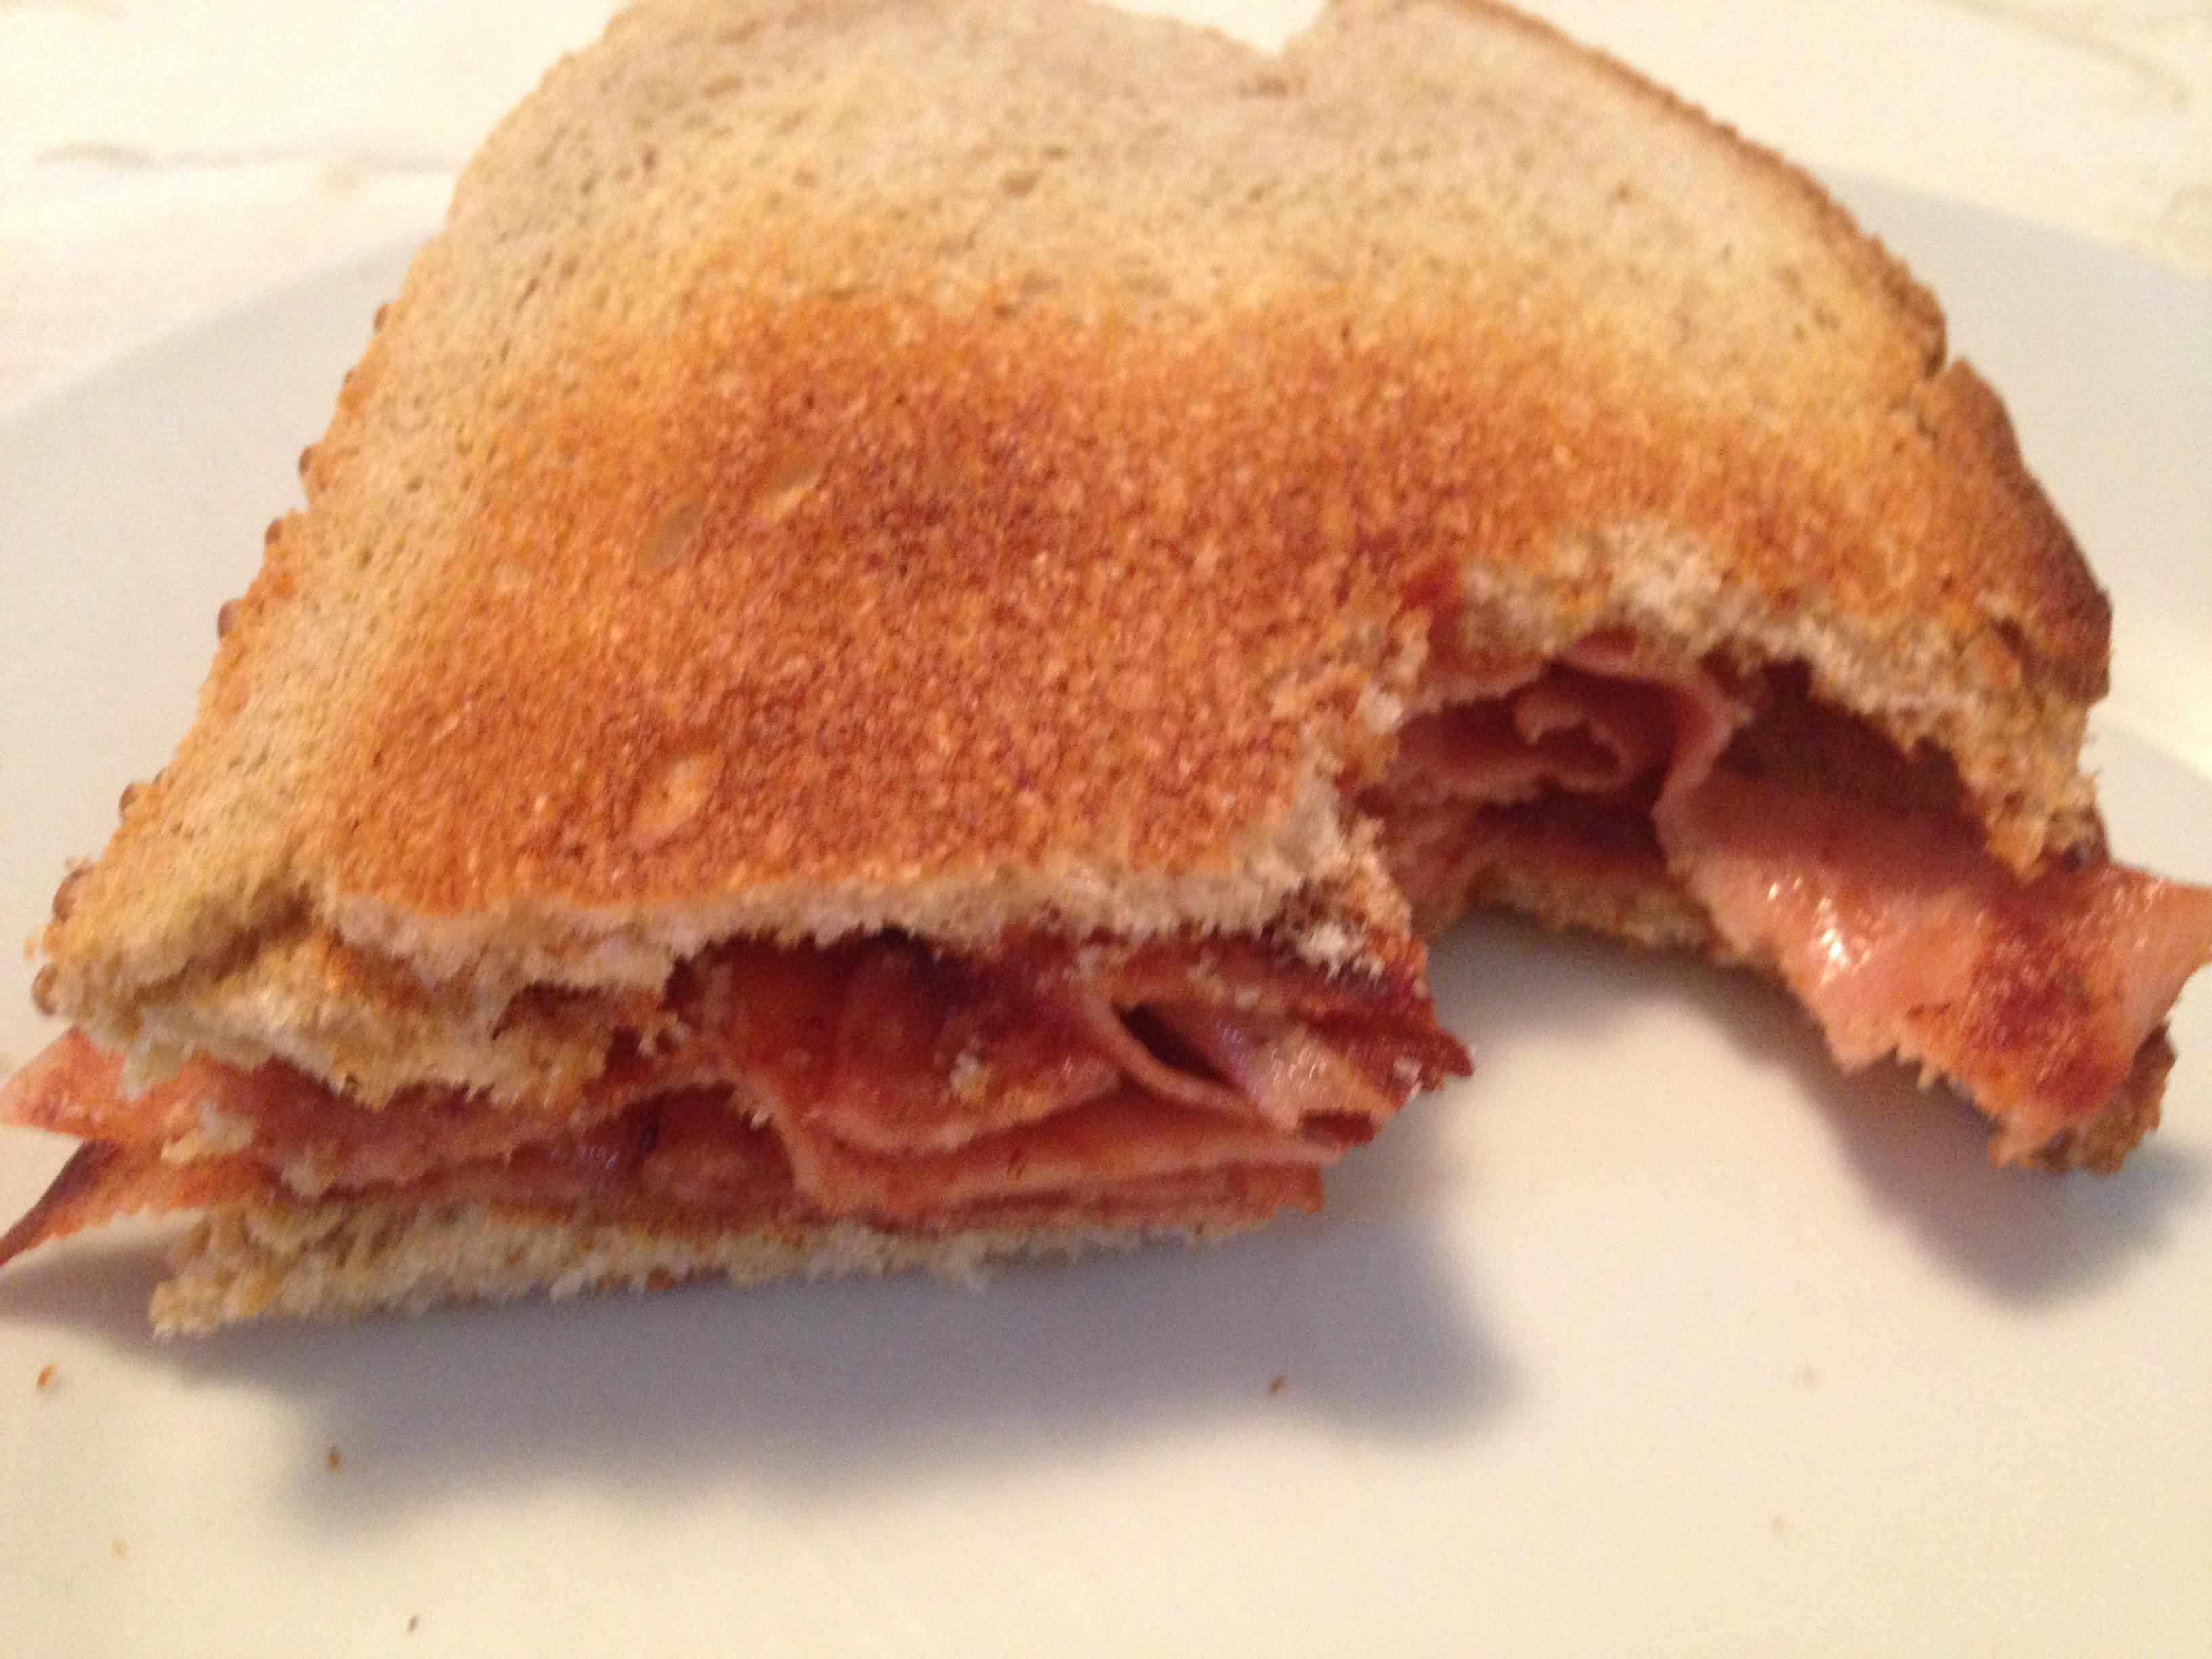 Sick Day Sandwich